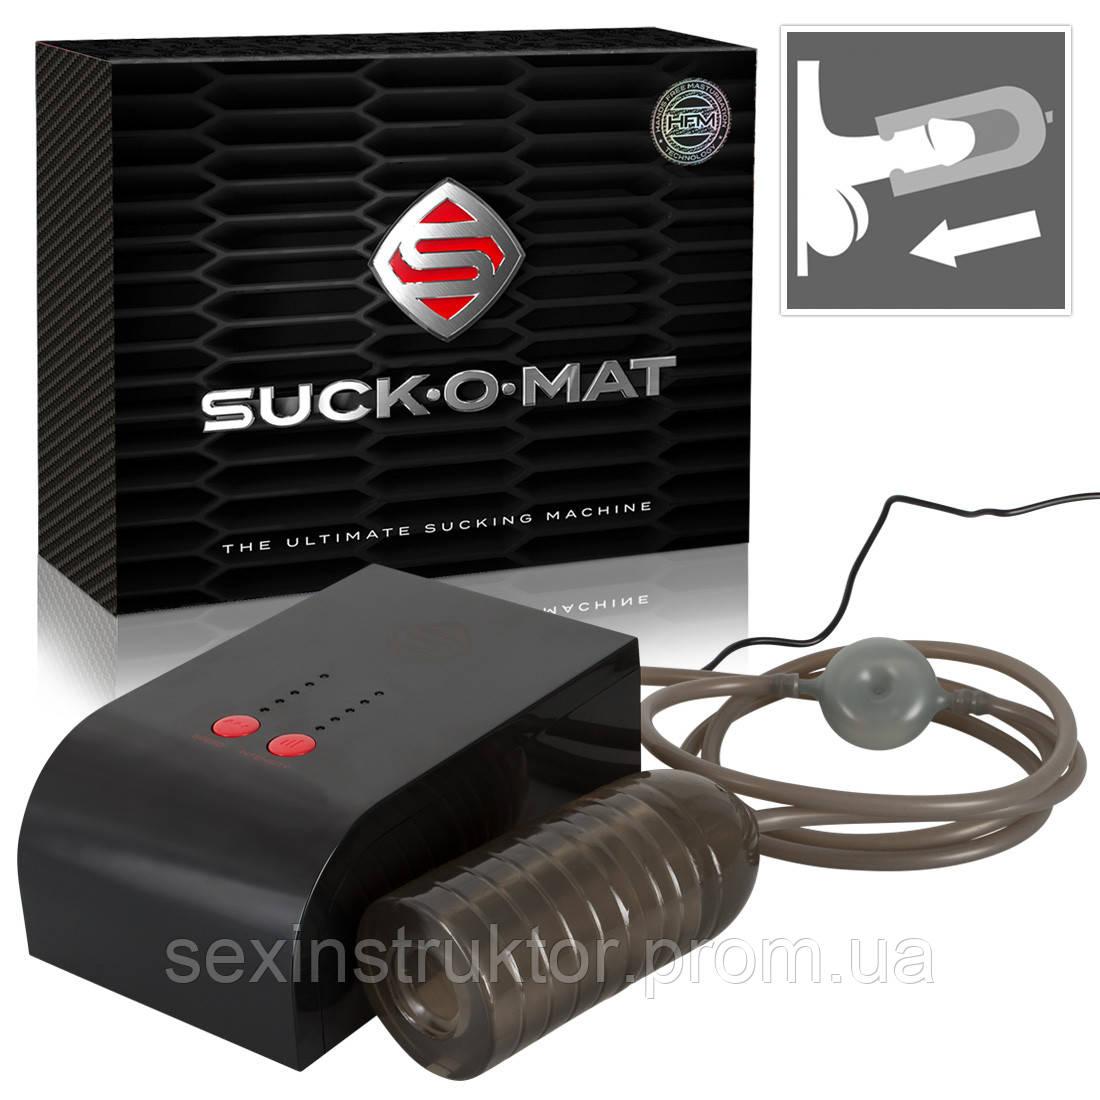 Мастурбатор - Suck-O-Mat